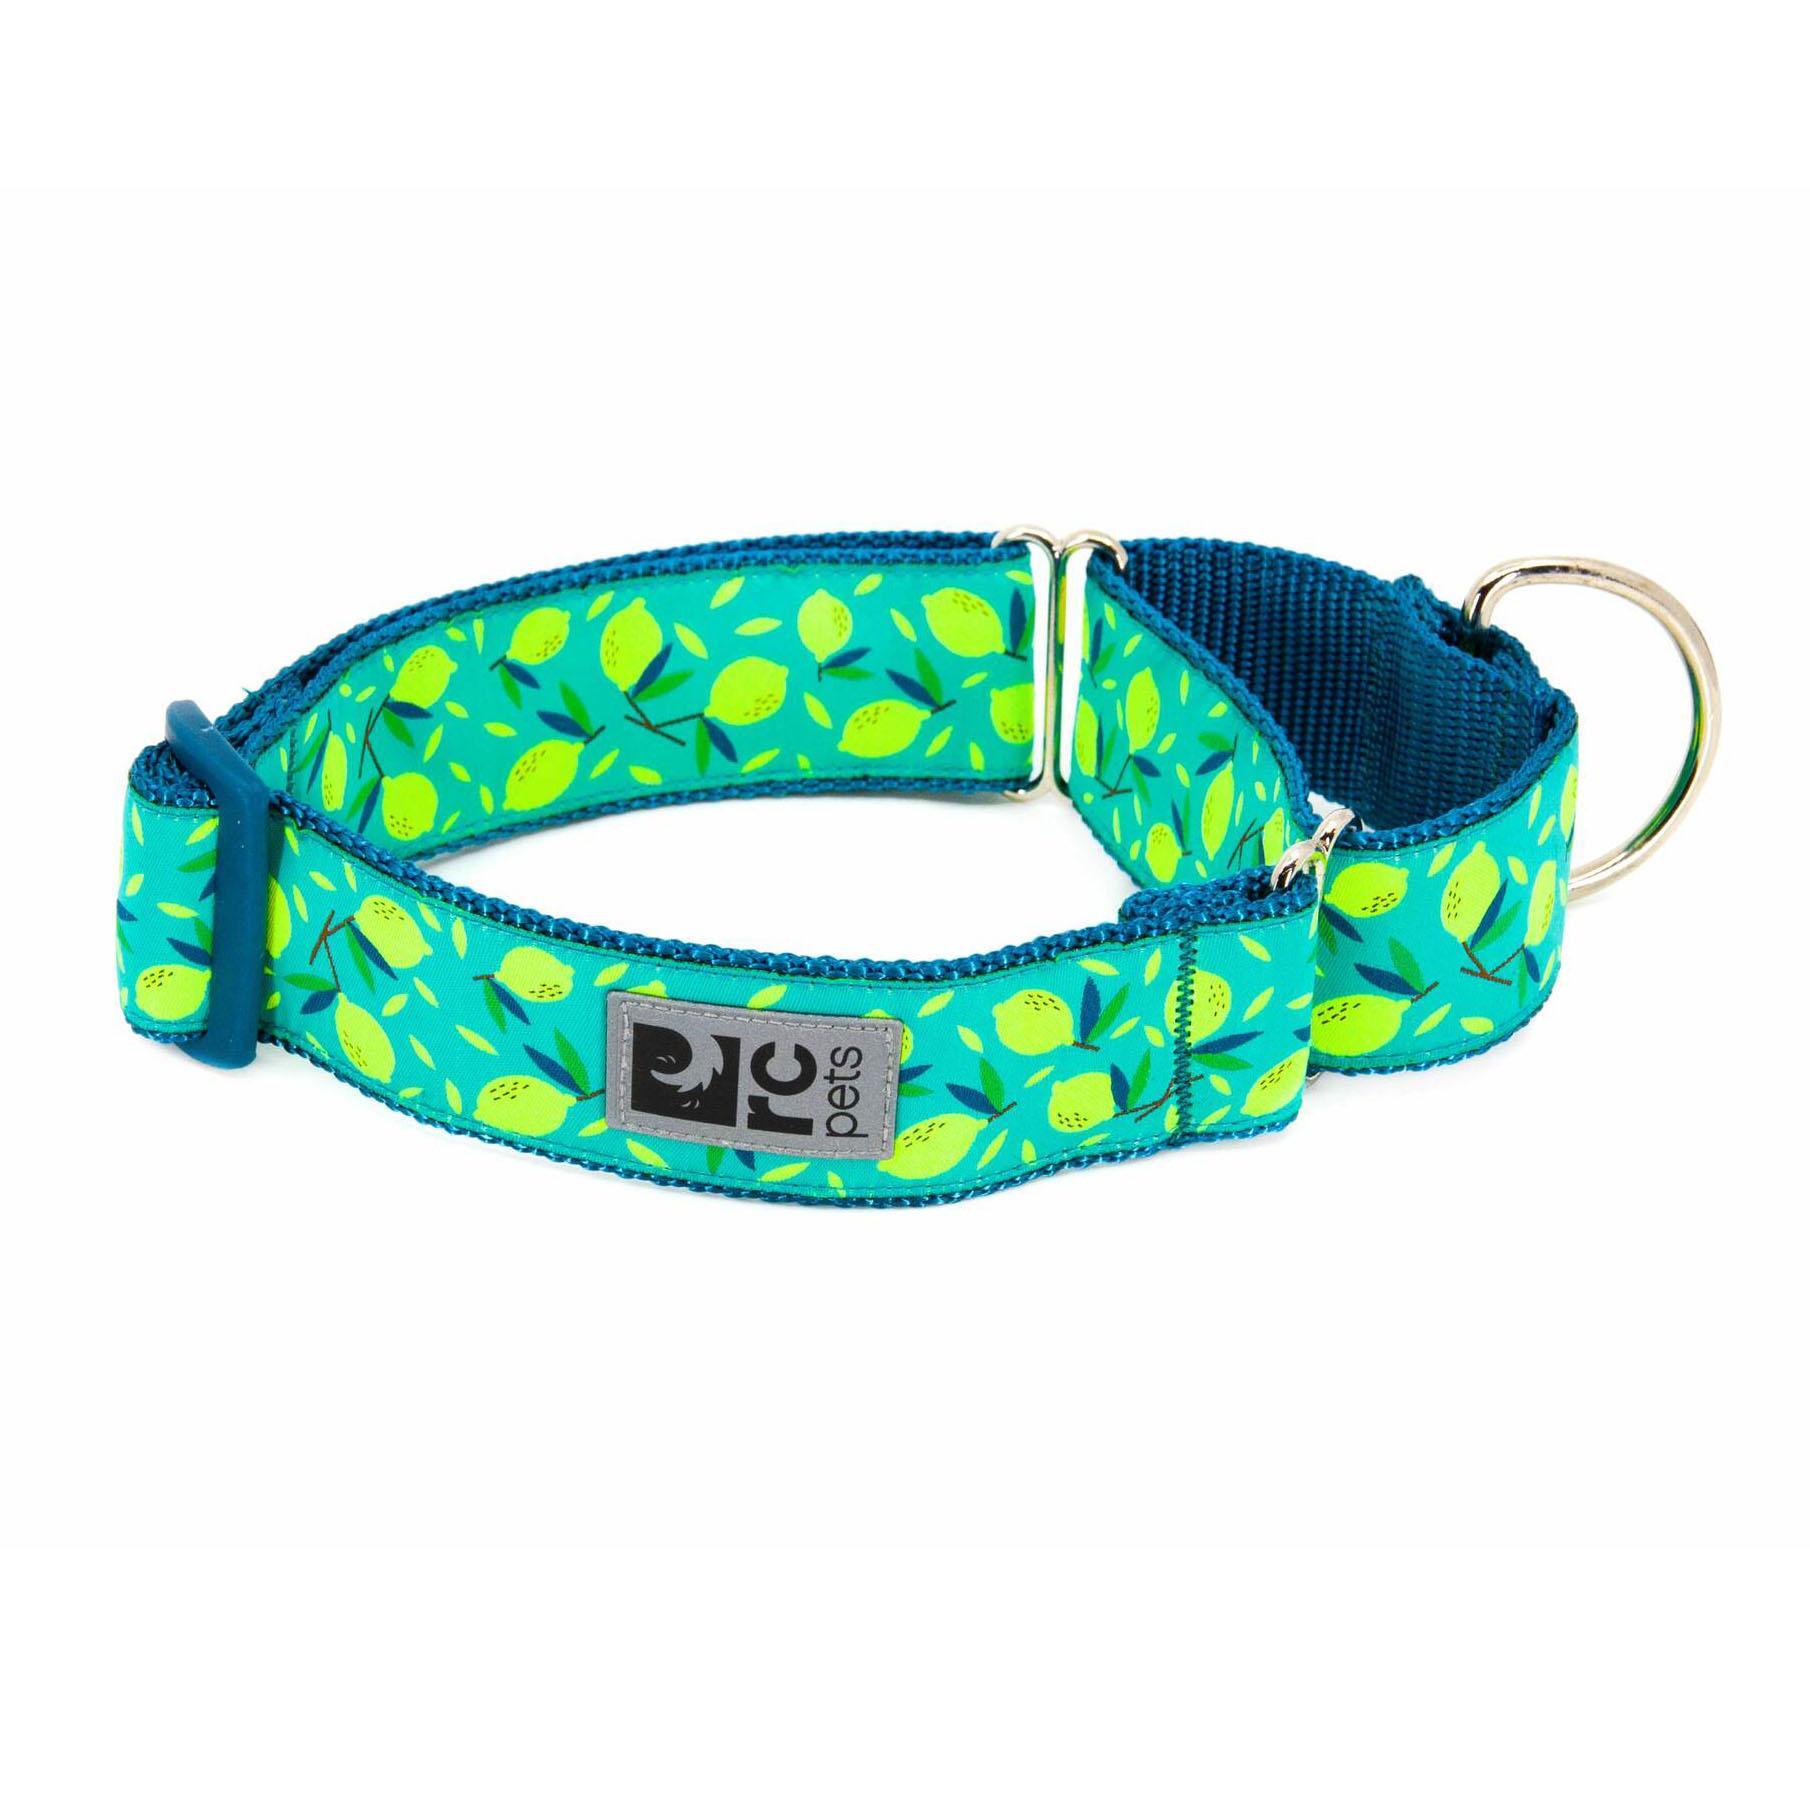 All Webbing Martingale Dog Training Collar - Lemonade